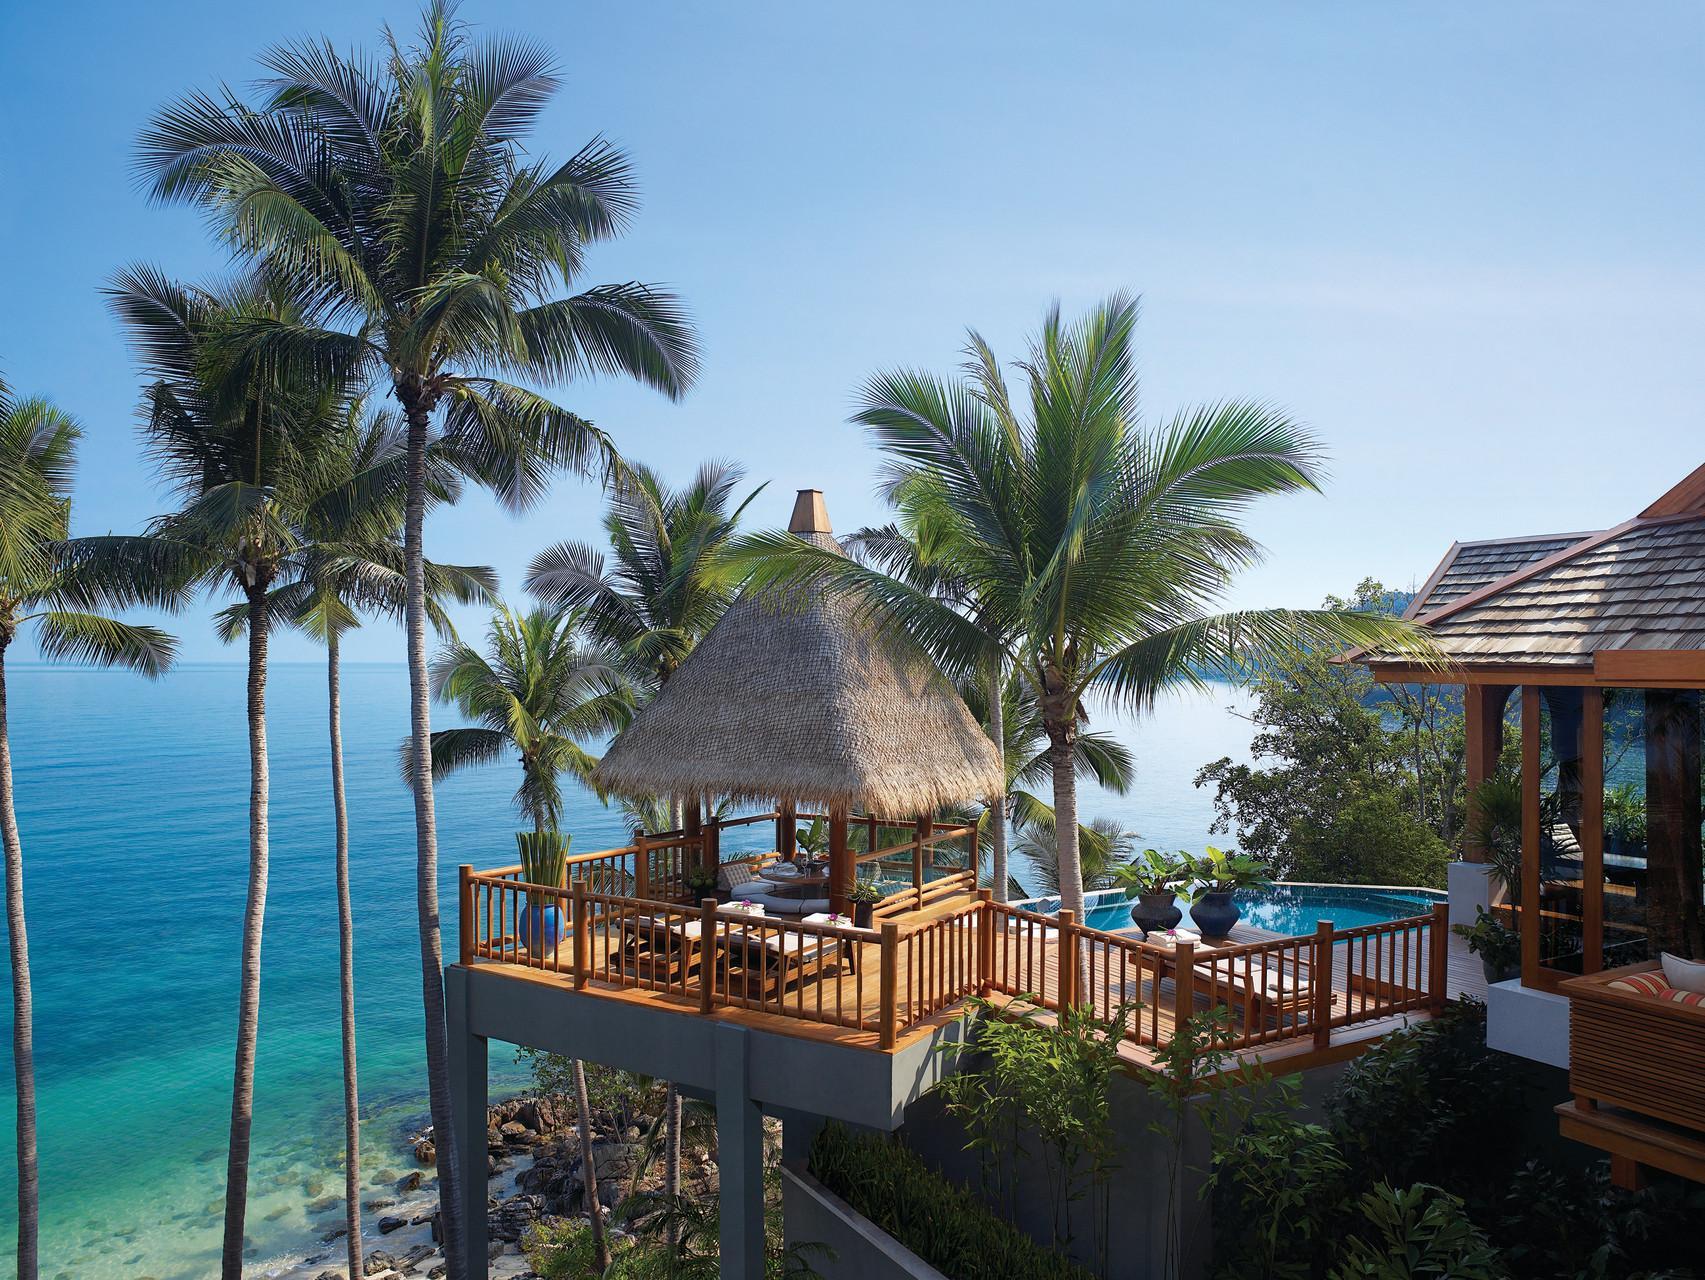 Four Seasons Resort Koh Samui- Top 10 Best Luxury Hotels And Resorts in Koh Samui